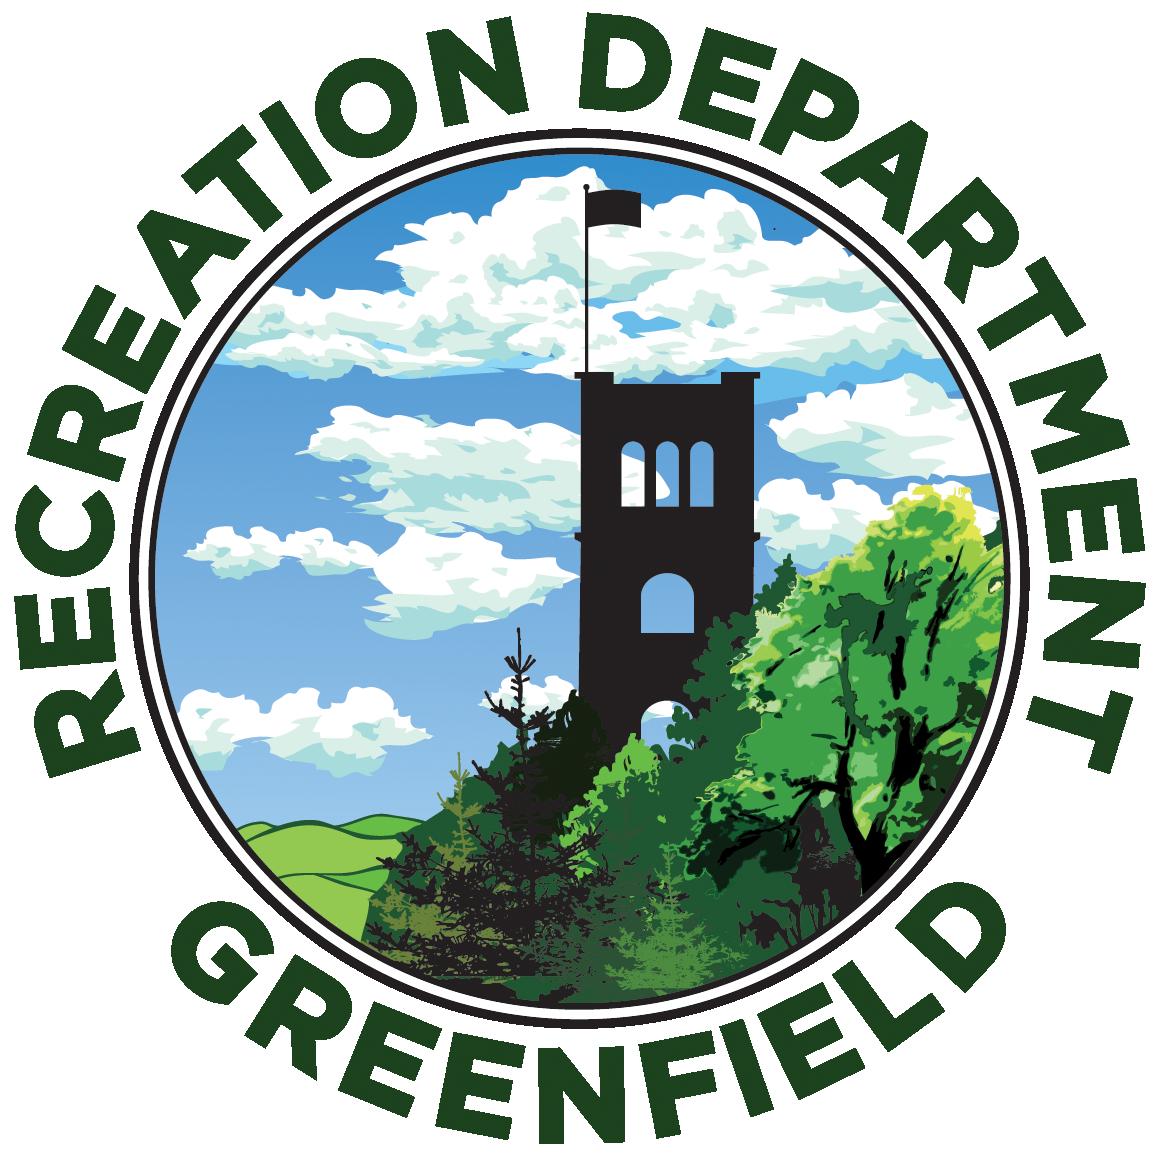 clipart park recreation center